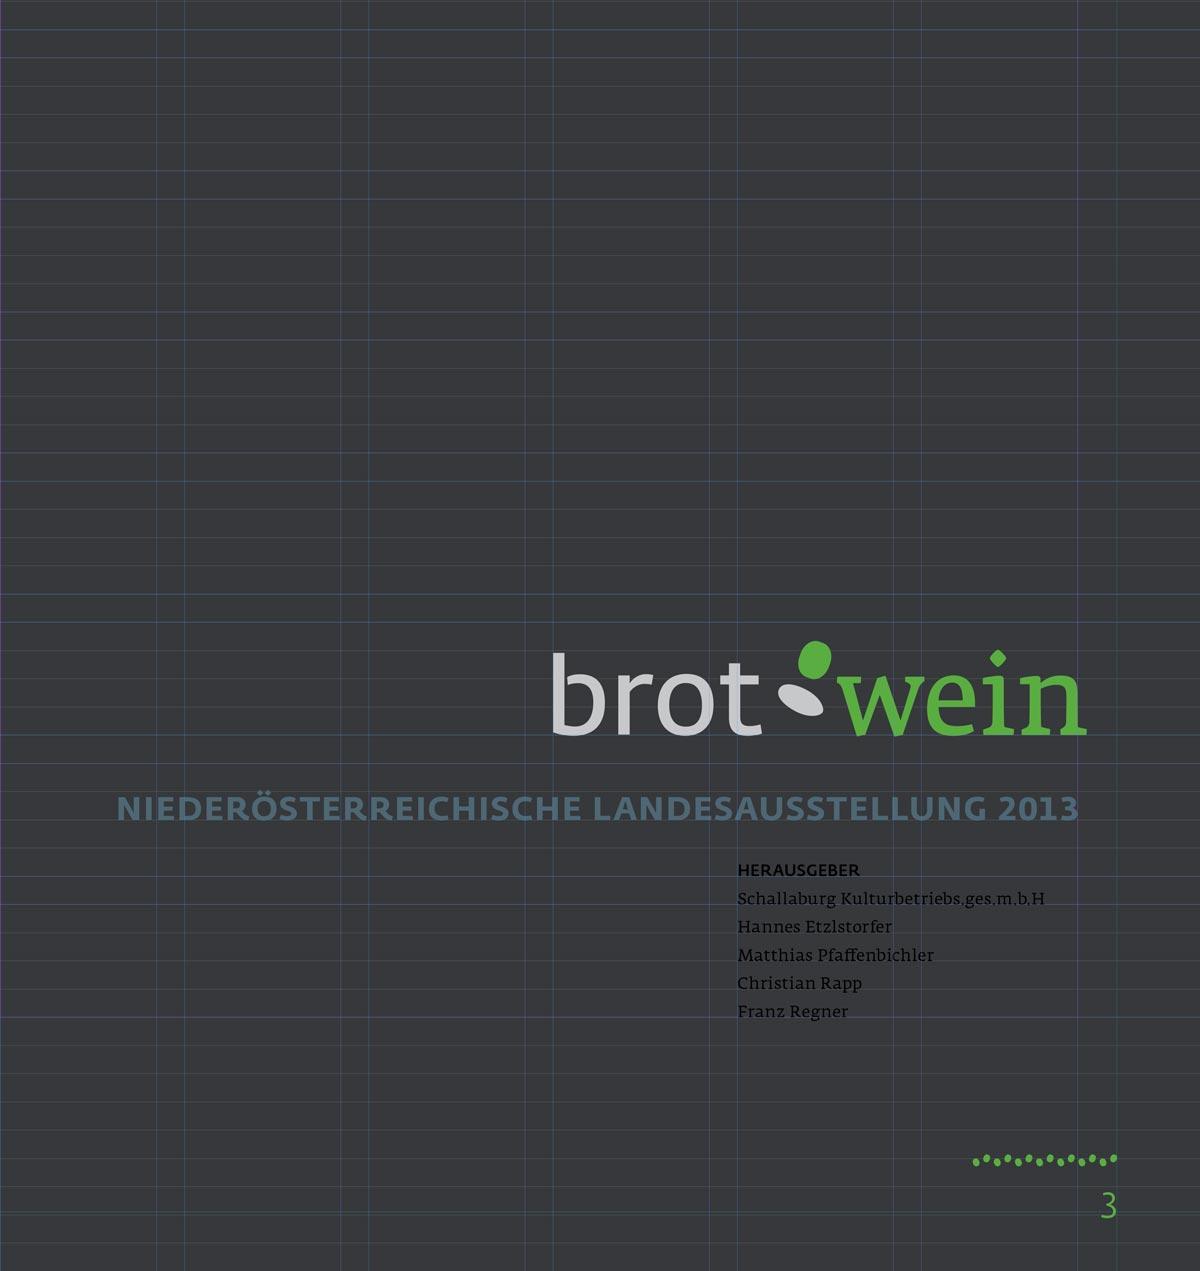 Herausgeber: Schallabung Kulturbetriebs.ges.m.b.H, Dr. Hannes Etzlstorfer, Dr. Matthias Pfaffenbichlex, Dr. Christian Rapp, DI Franz Regner